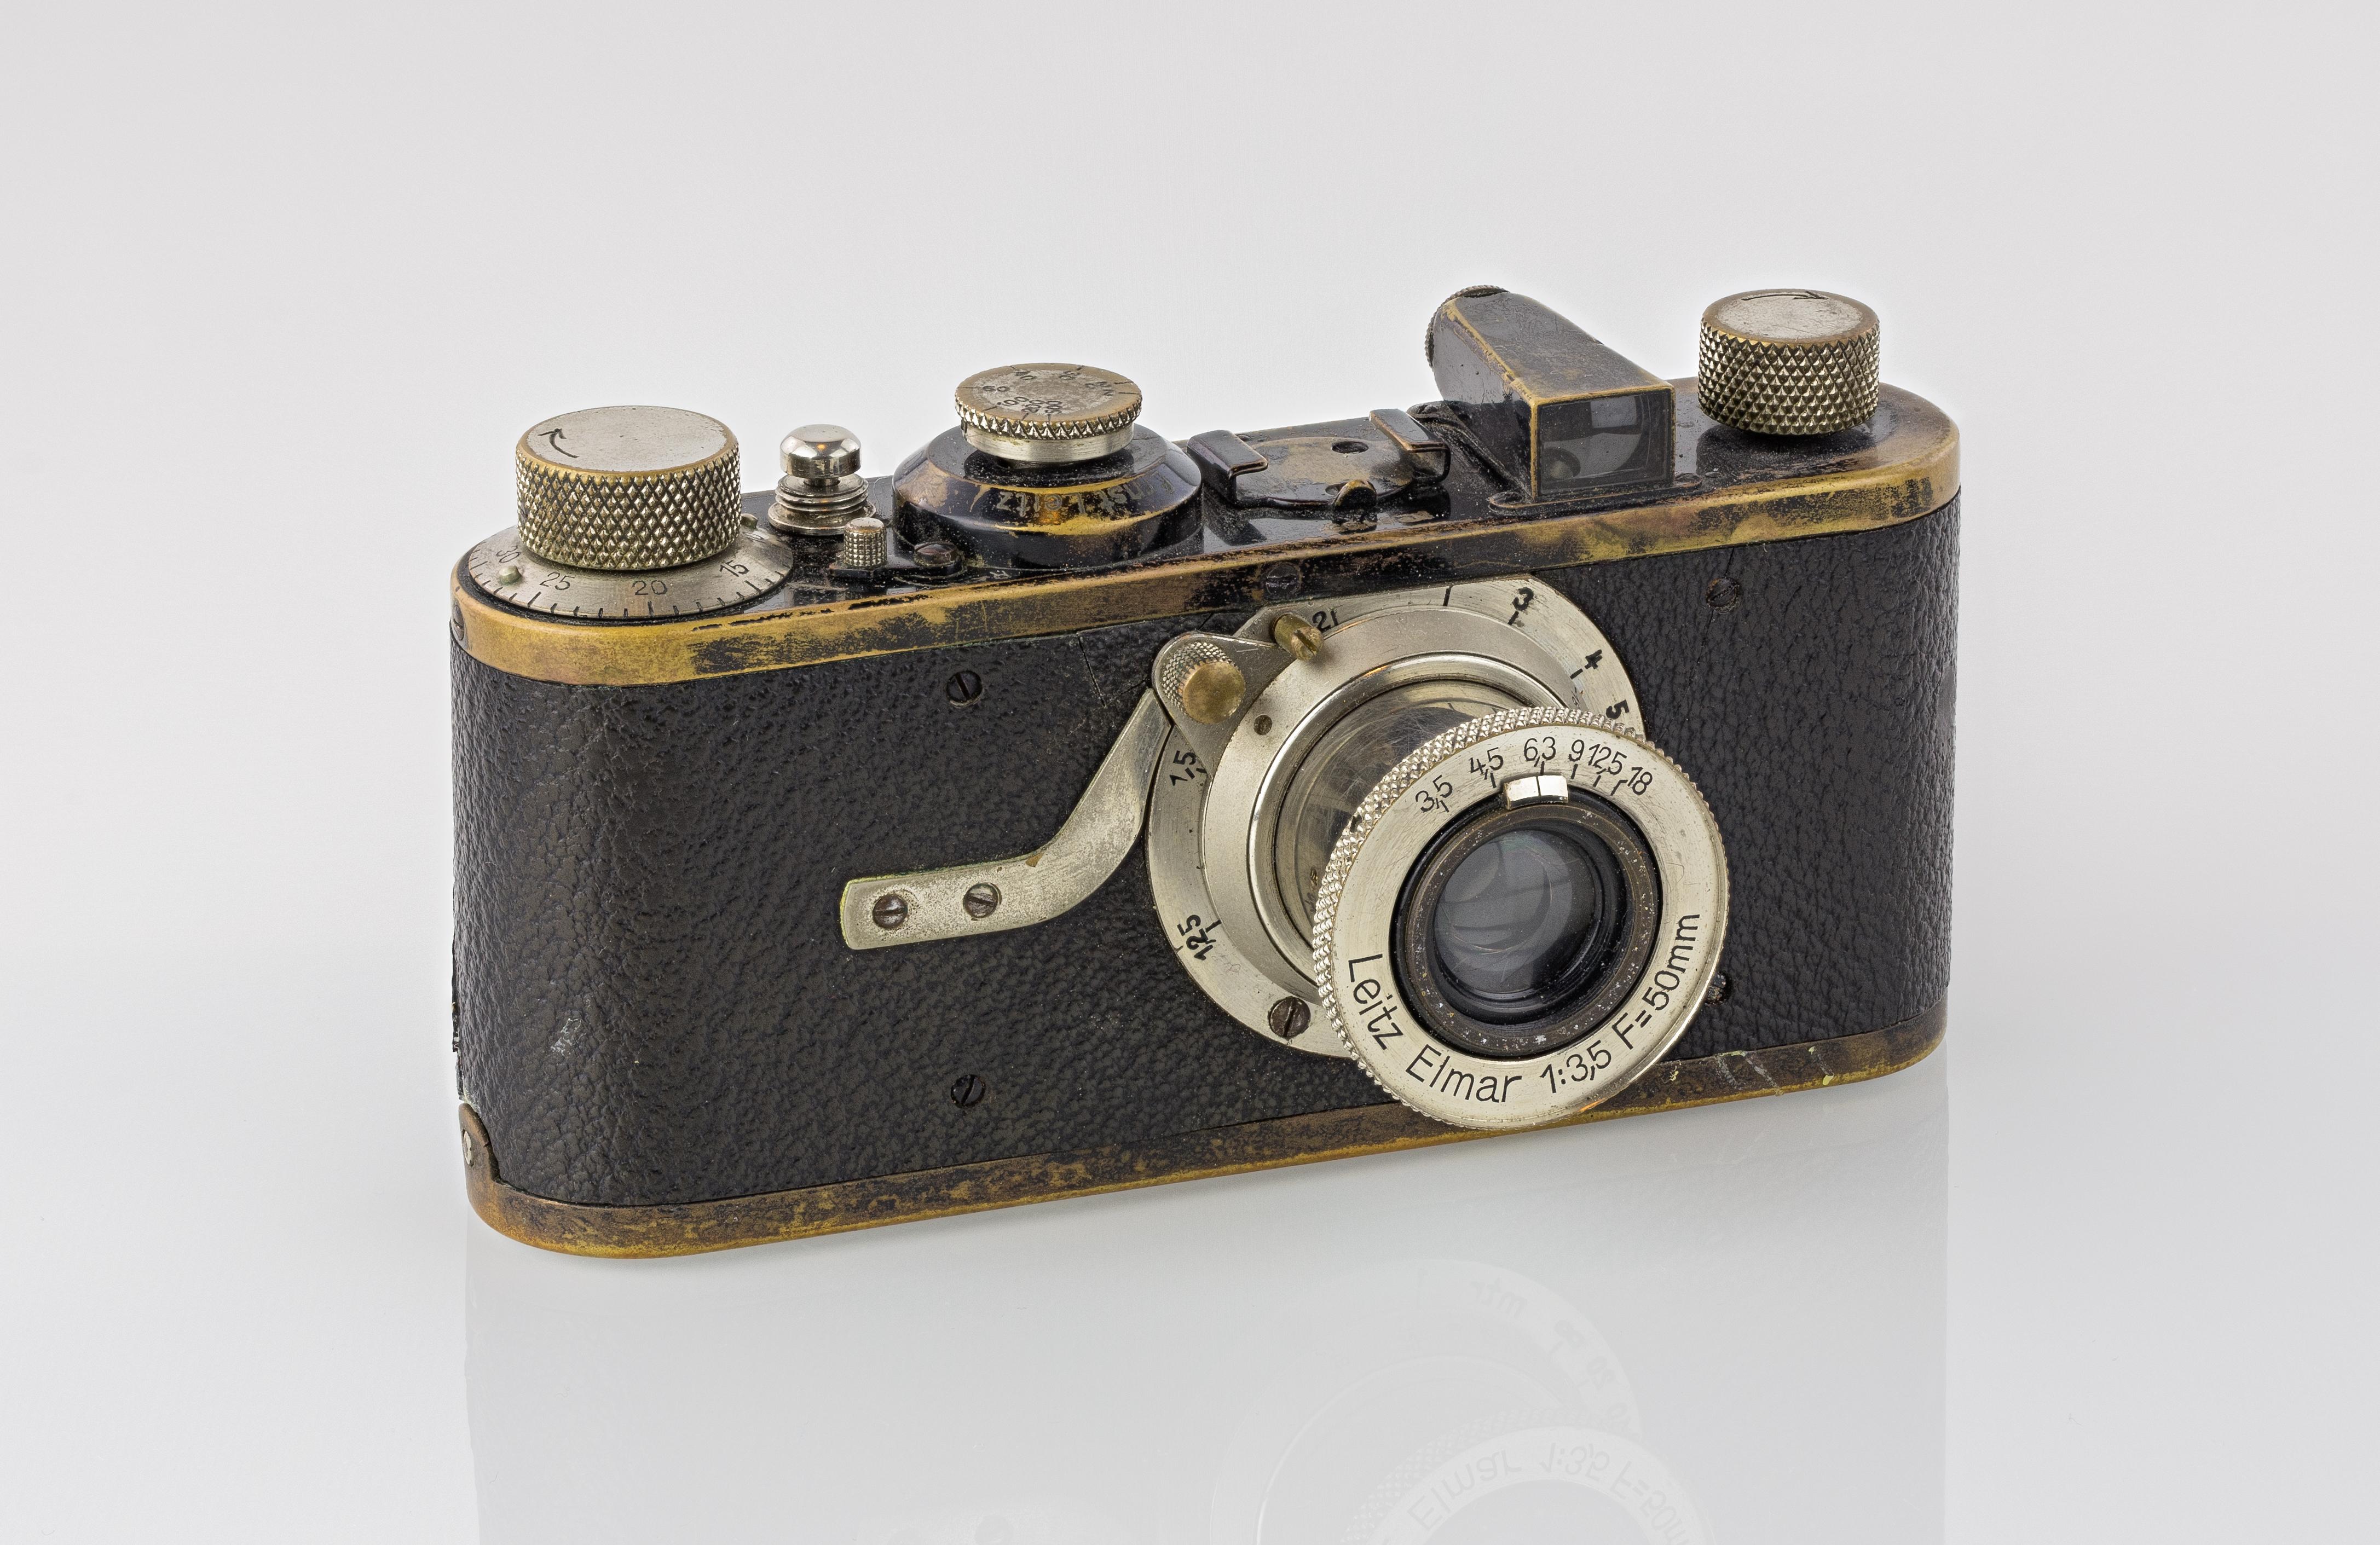 File:LEI0060 186 Leica I Sn.5193 1927 Originalzustand Front side-FS 5632-Bearbeitet.jpg